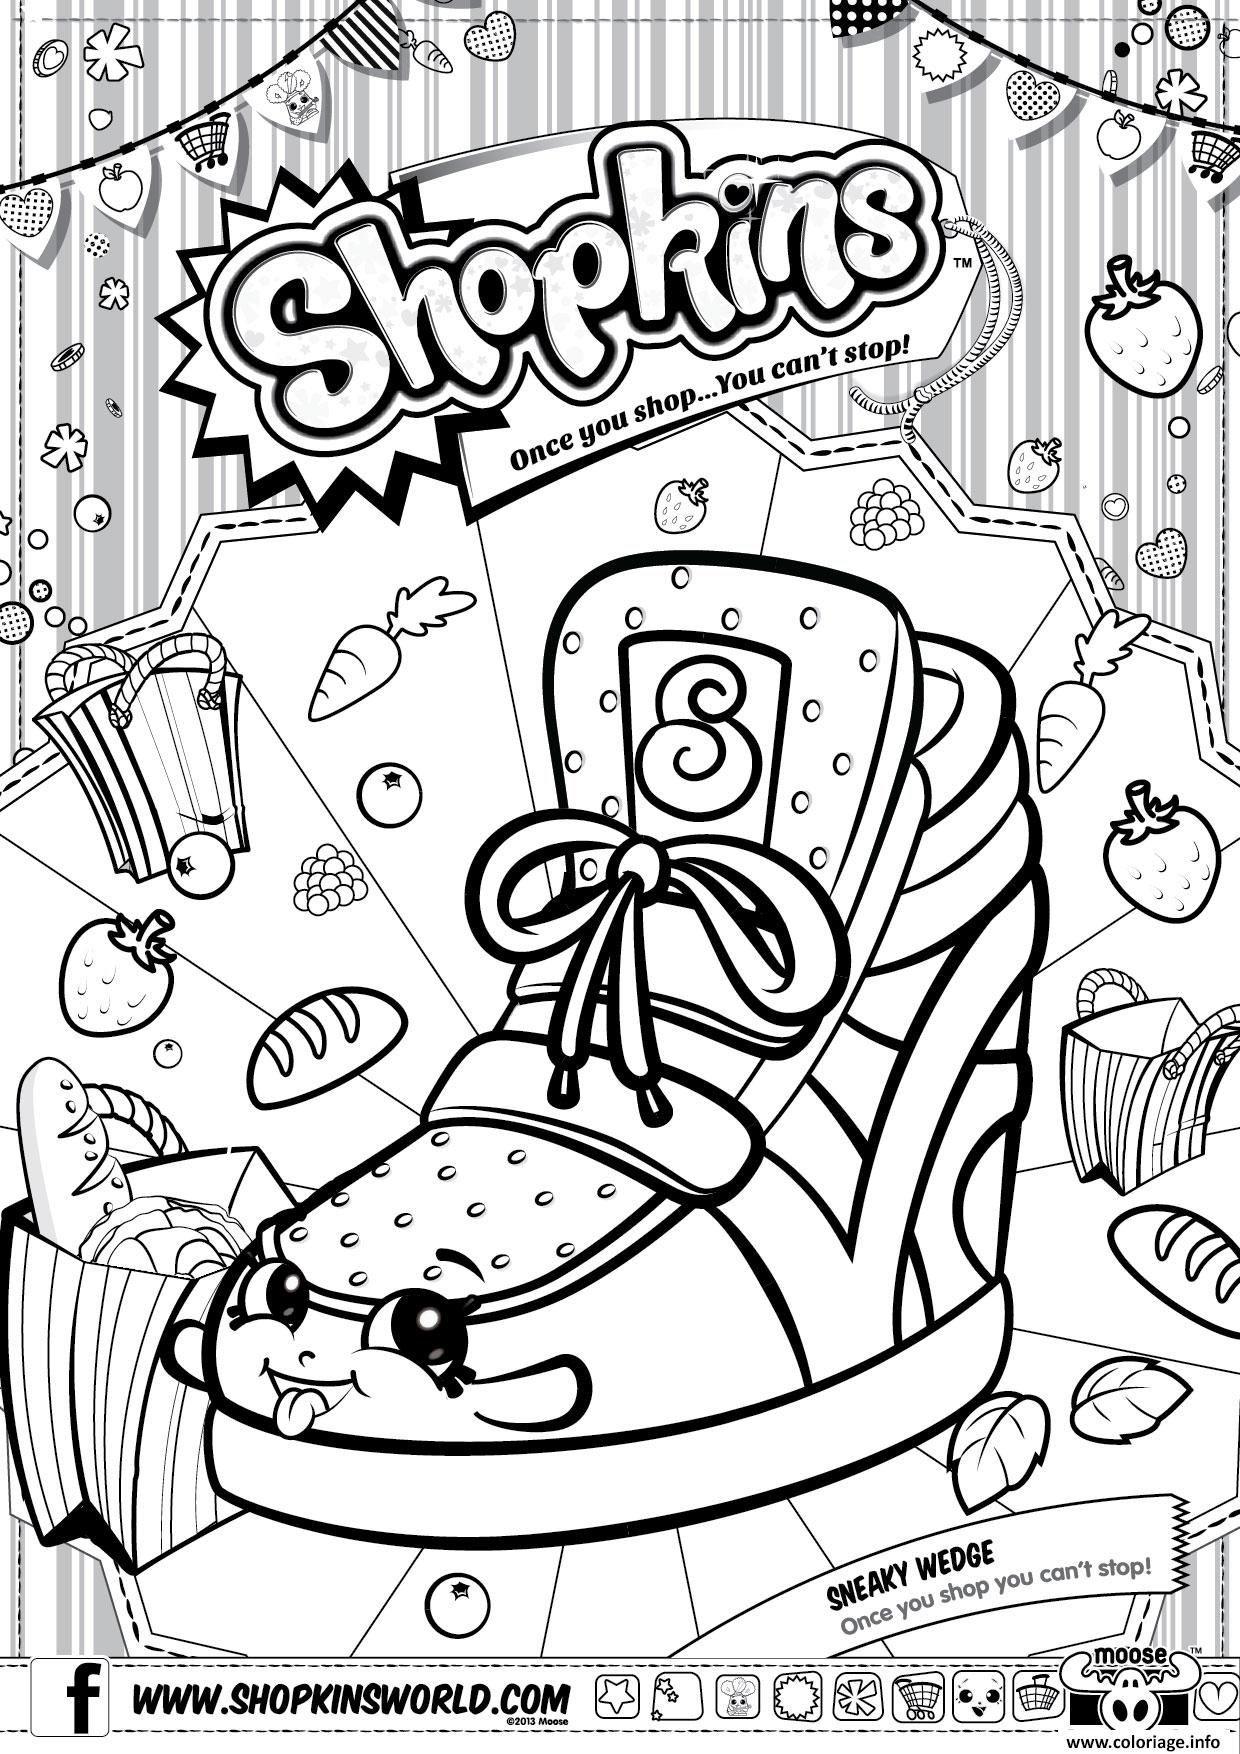 Image Peppa Pig A Imprimer Beau Image Coloriage Peppa Pig Colorier Dessin Imprimer Pour Imprimer